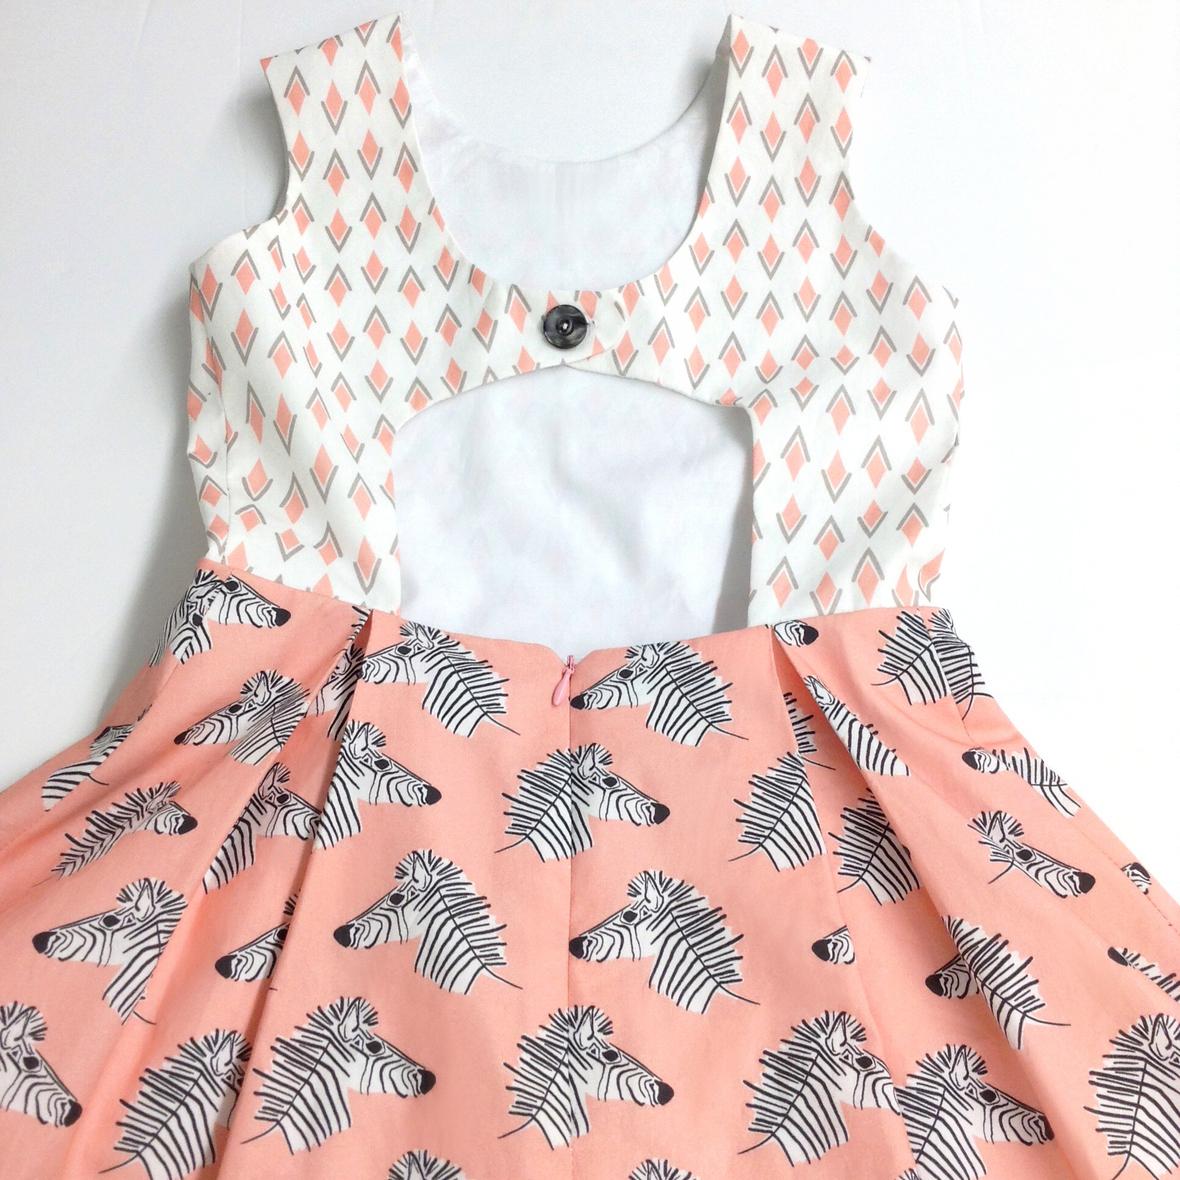 Rebel Party Dress in Zebra Hills Fabric